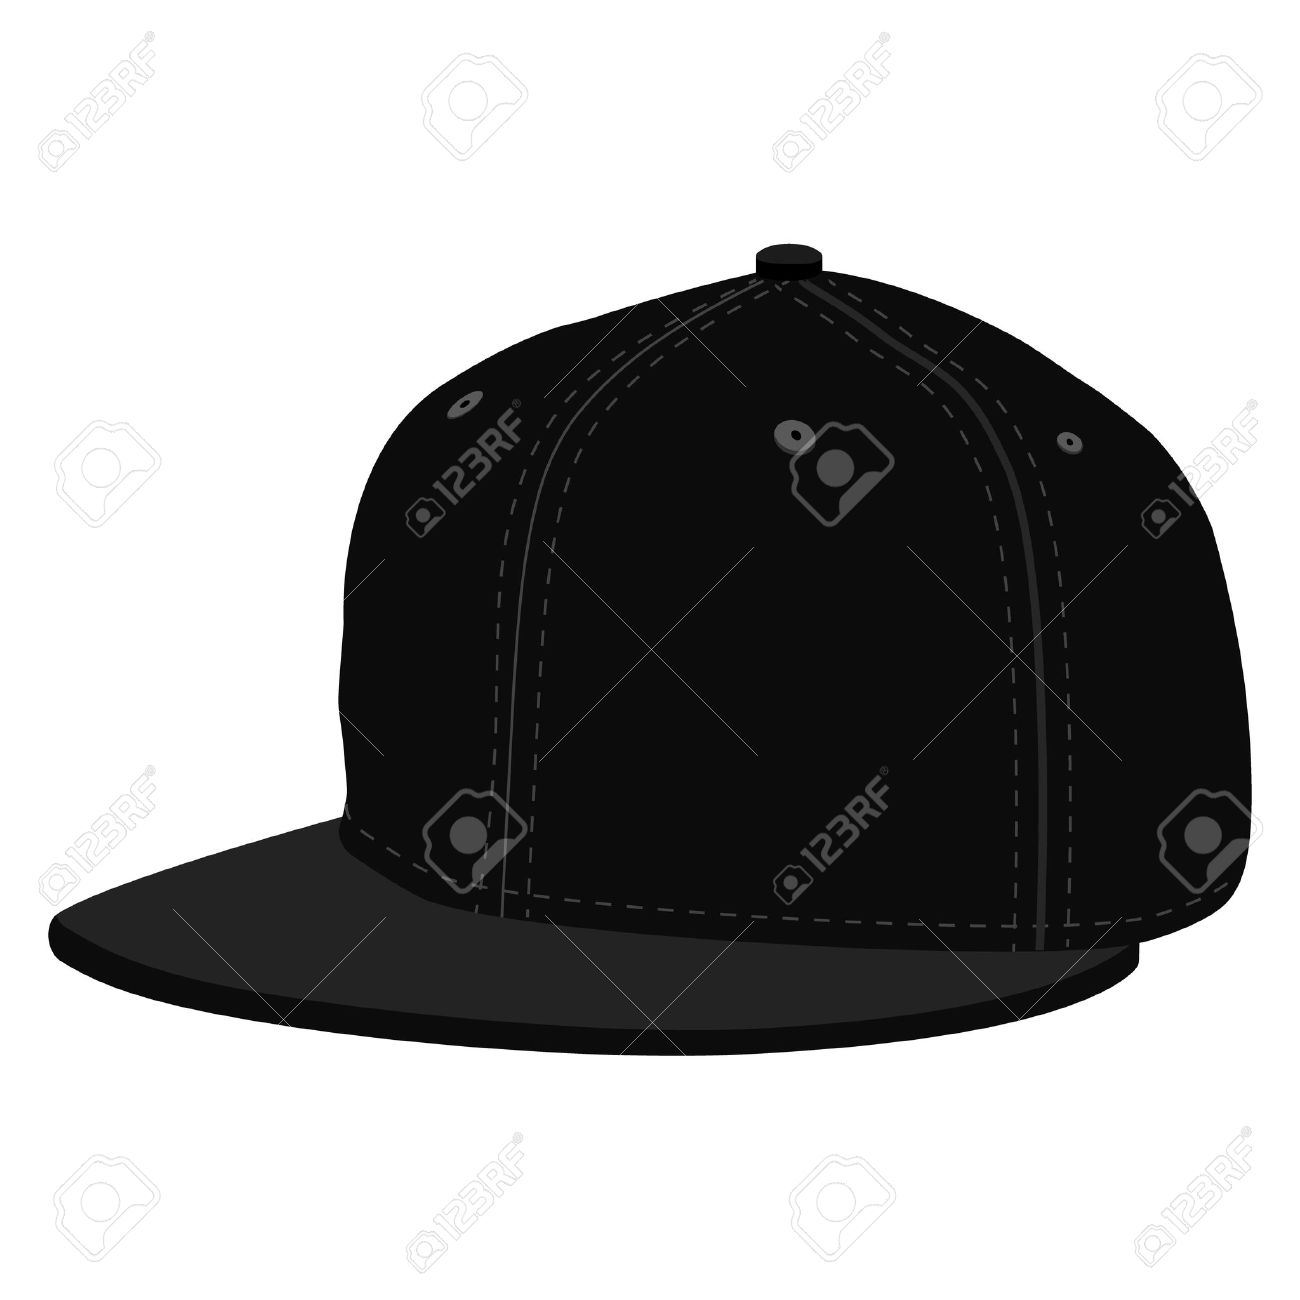 illustration black hip hop or rapper baseball cap. Baseball cap icon - 49353679